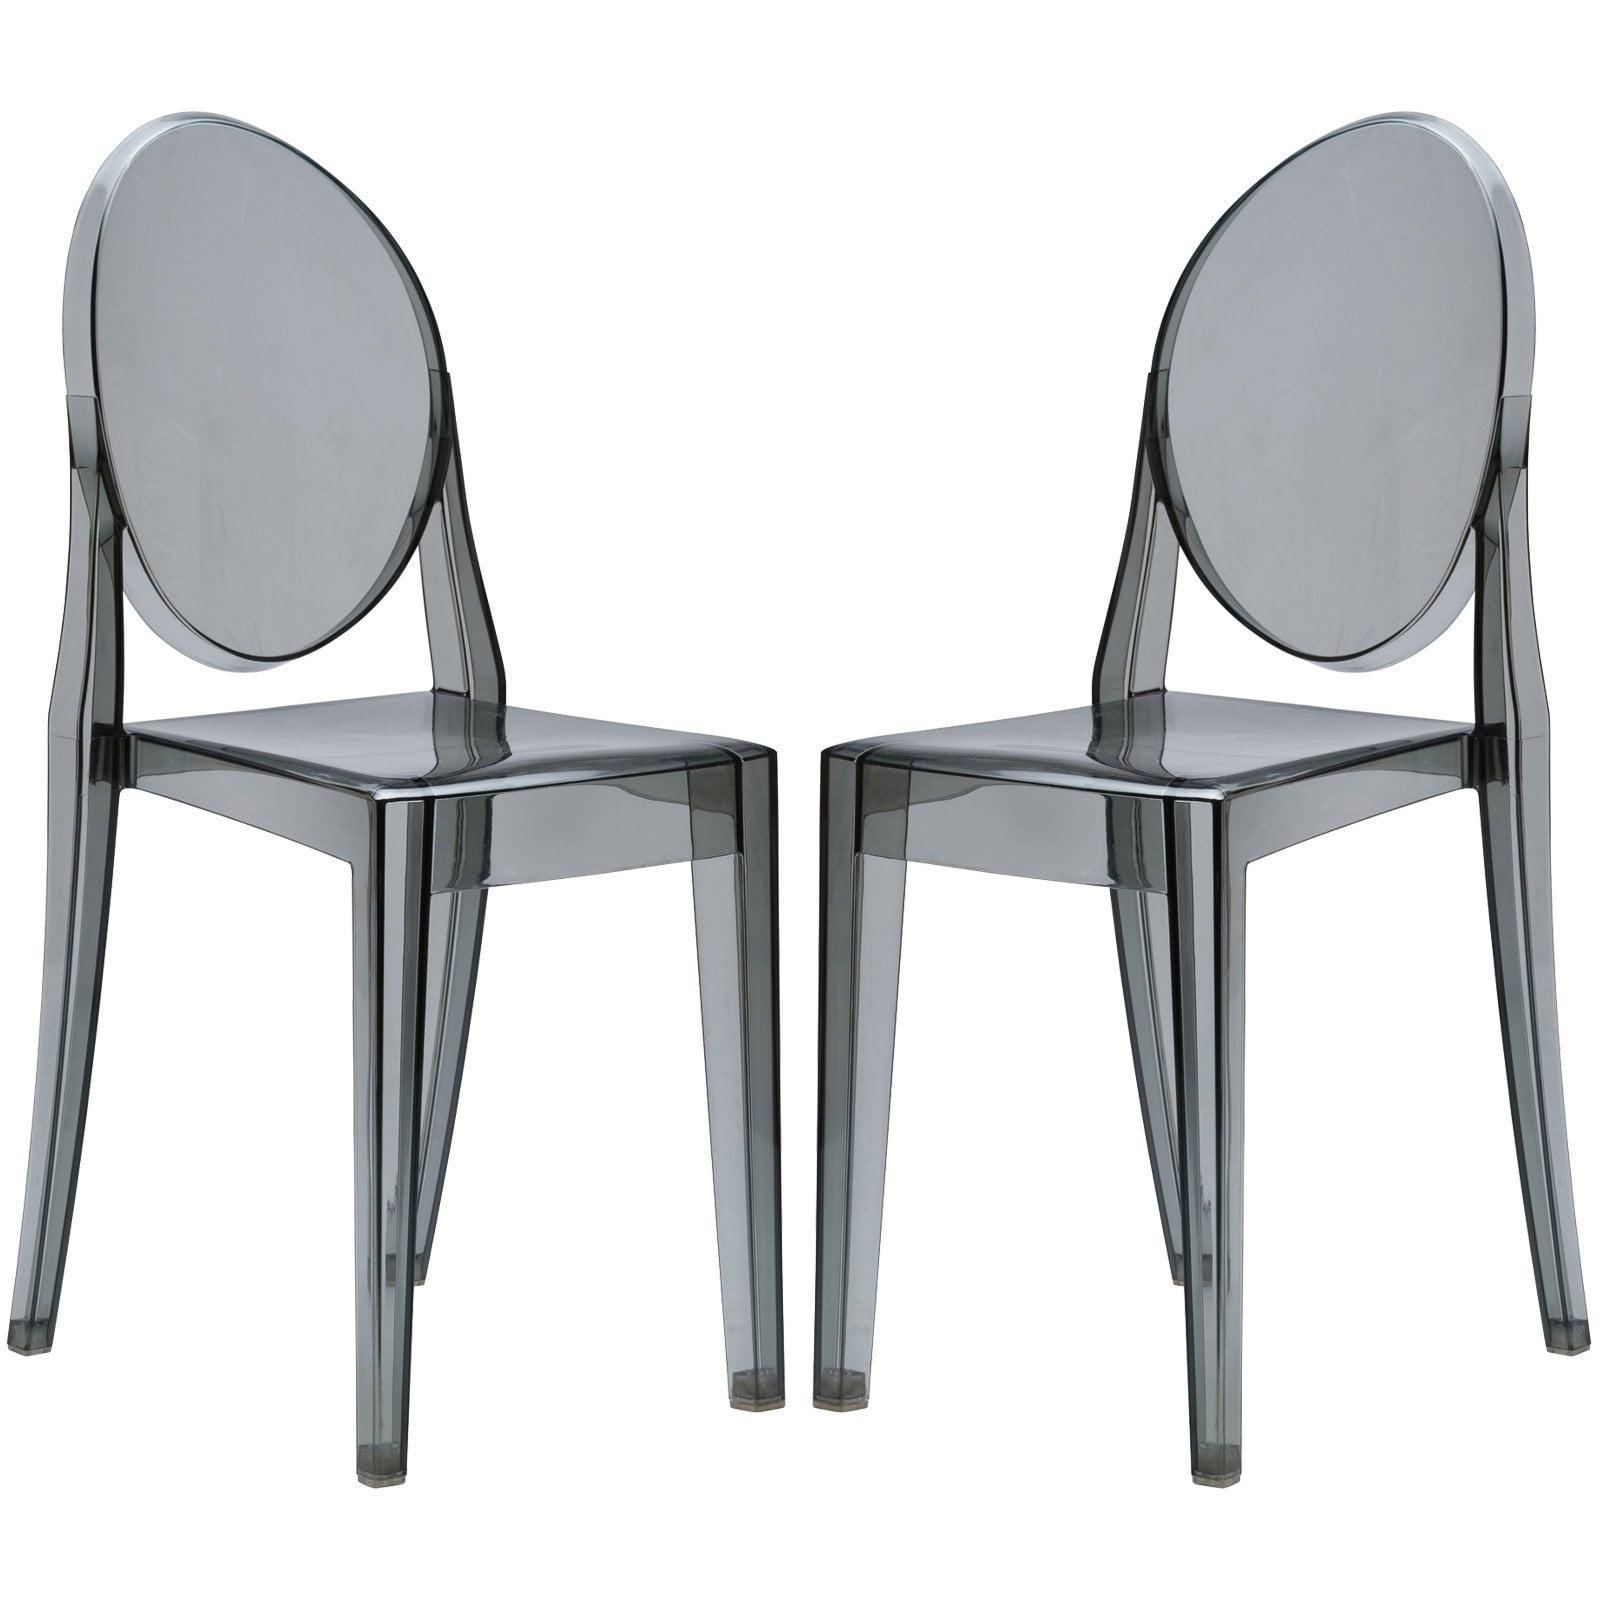 EdgeMod Burton Side Chair - Set of 2